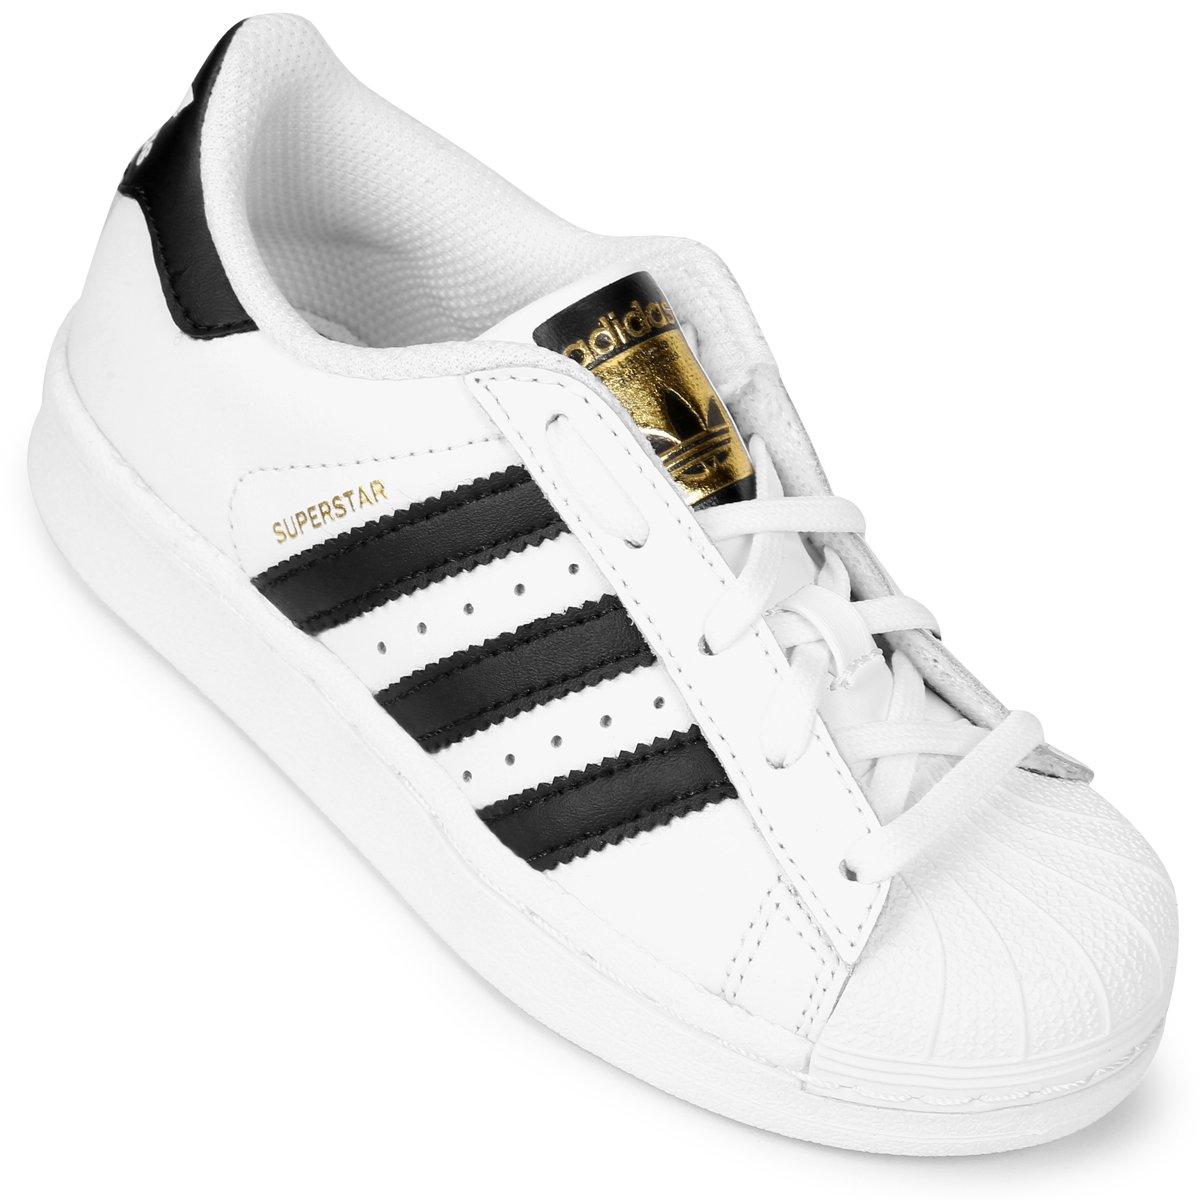 757eb62e39a ... new style tênis adidas superstar foundation el infantil brancopreto  8a389 33ba0 ...